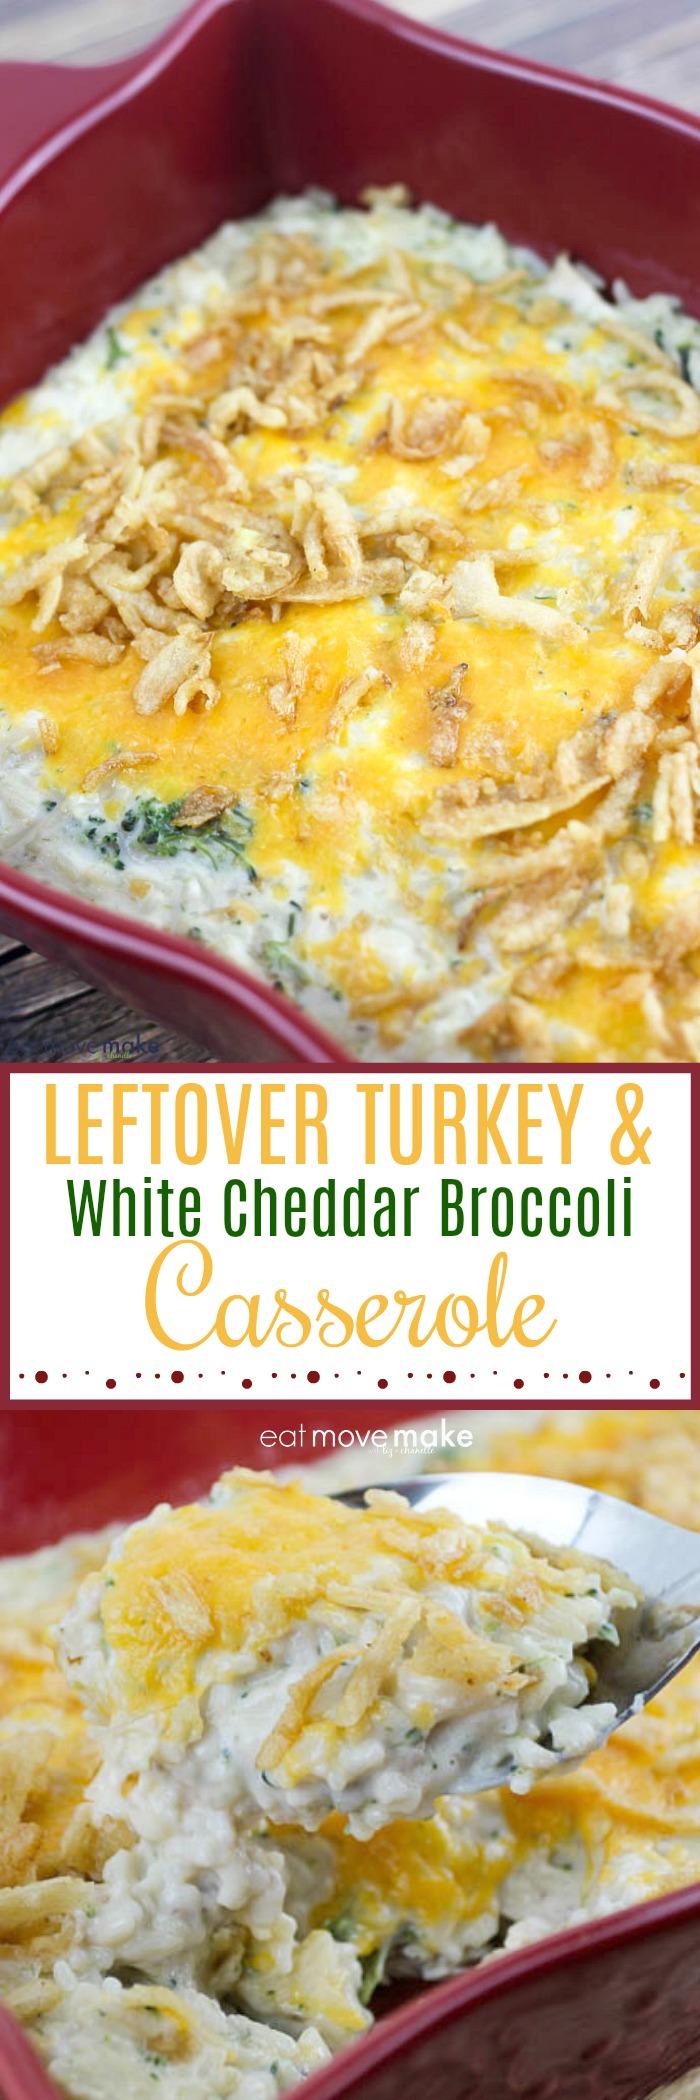 leftover turkey casserole